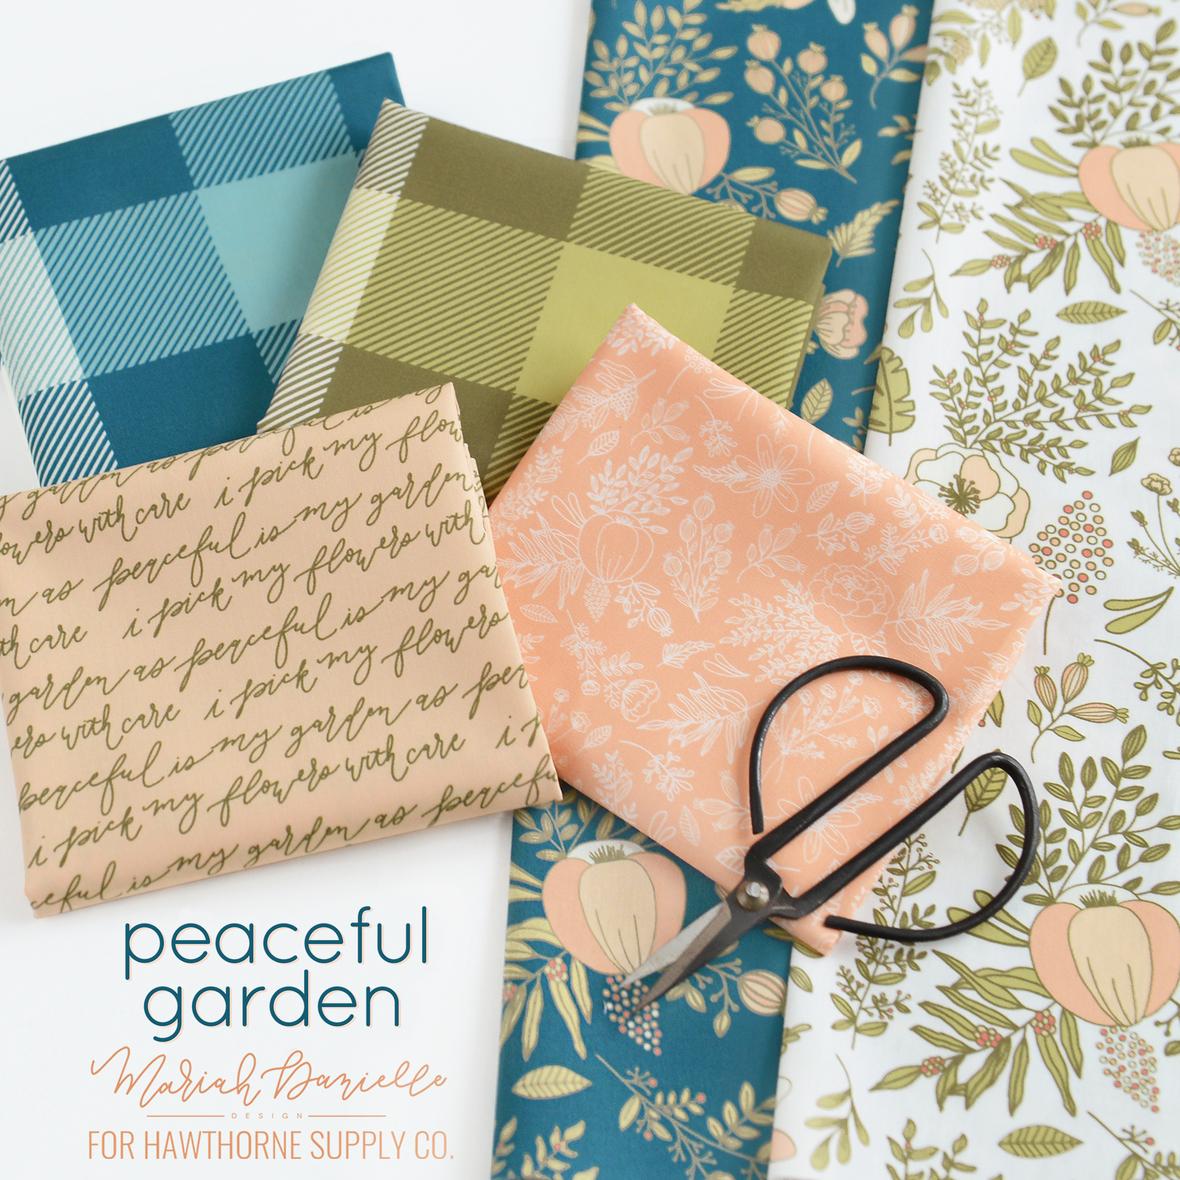 Mariah Danielle Peaceful Garden fabric for Hawthorne Supply Co 2.2